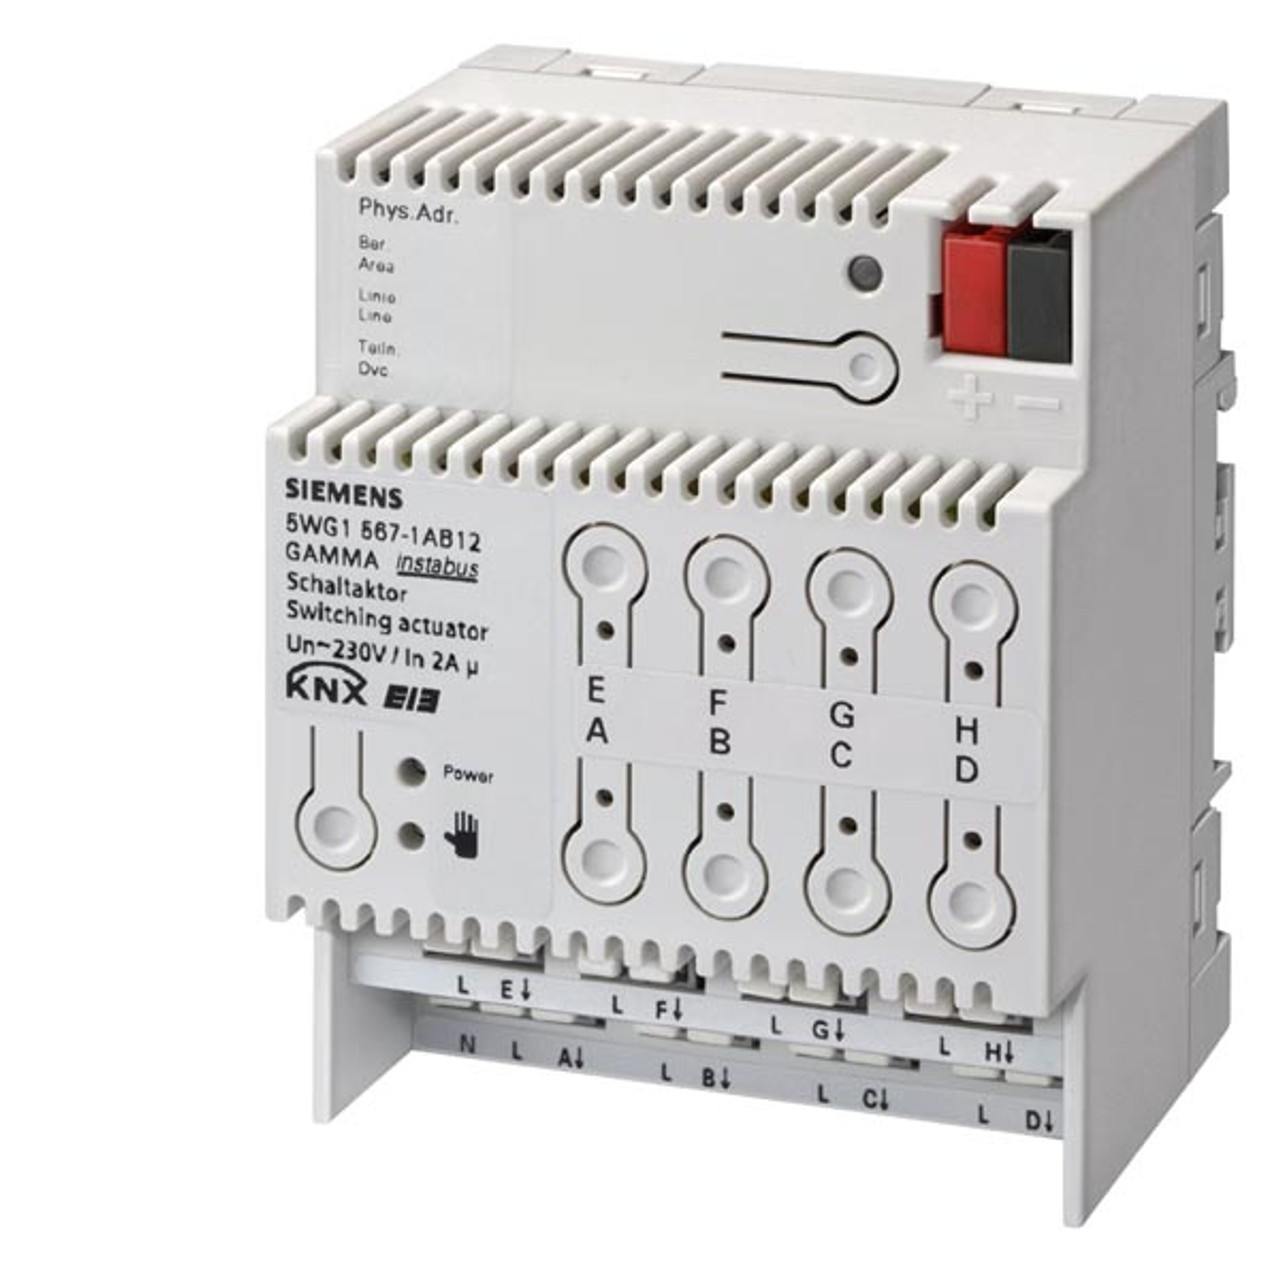 Siemens 5WG1567-1AB12